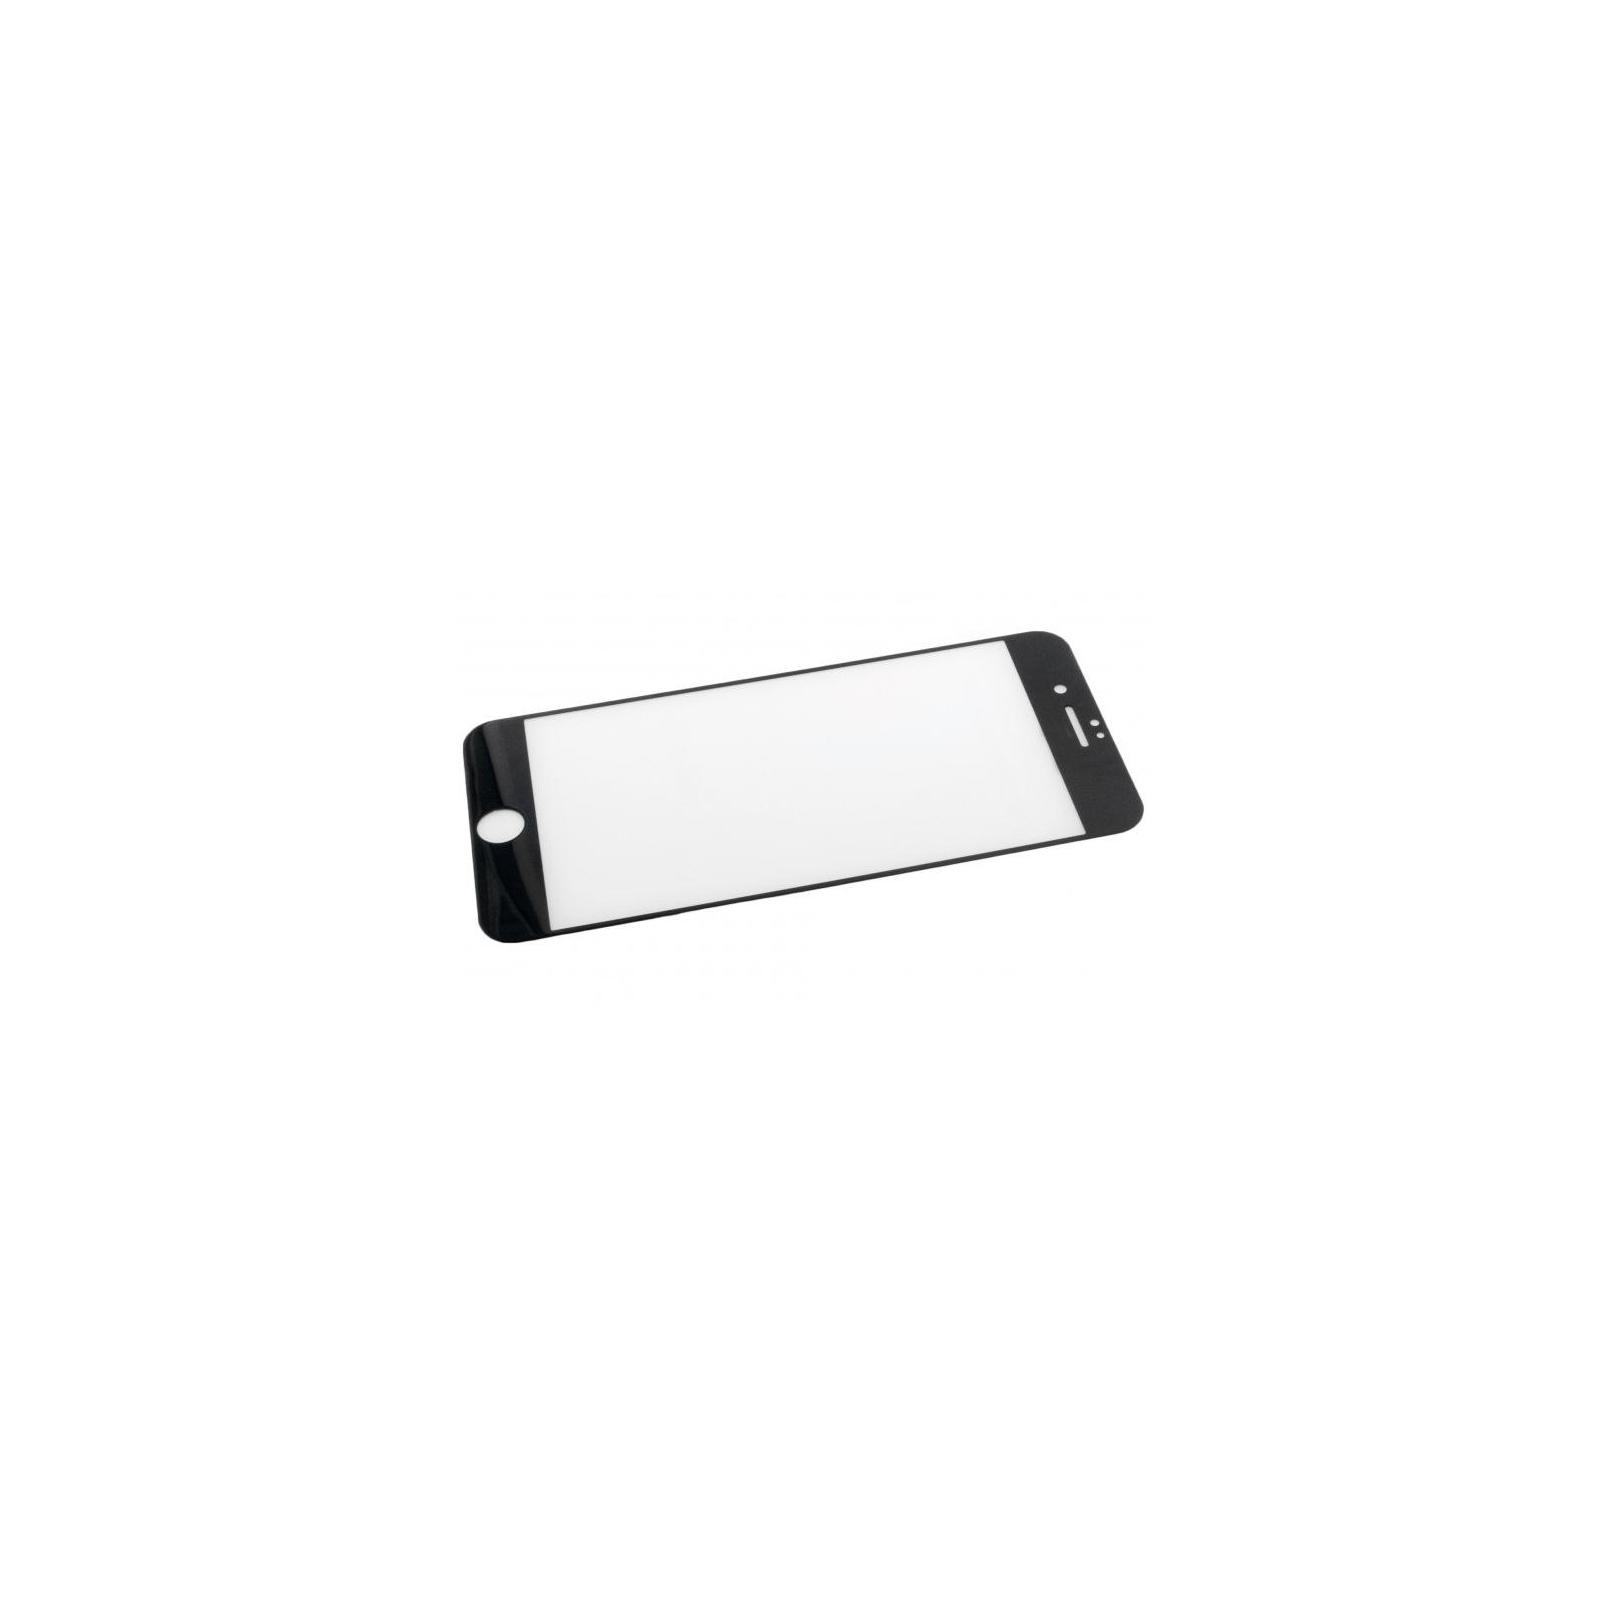 Стекло защитное iSG для Apple iPhone 7 Plus/8 Plus 3D Full Cover Black (SPG4406) изображение 2